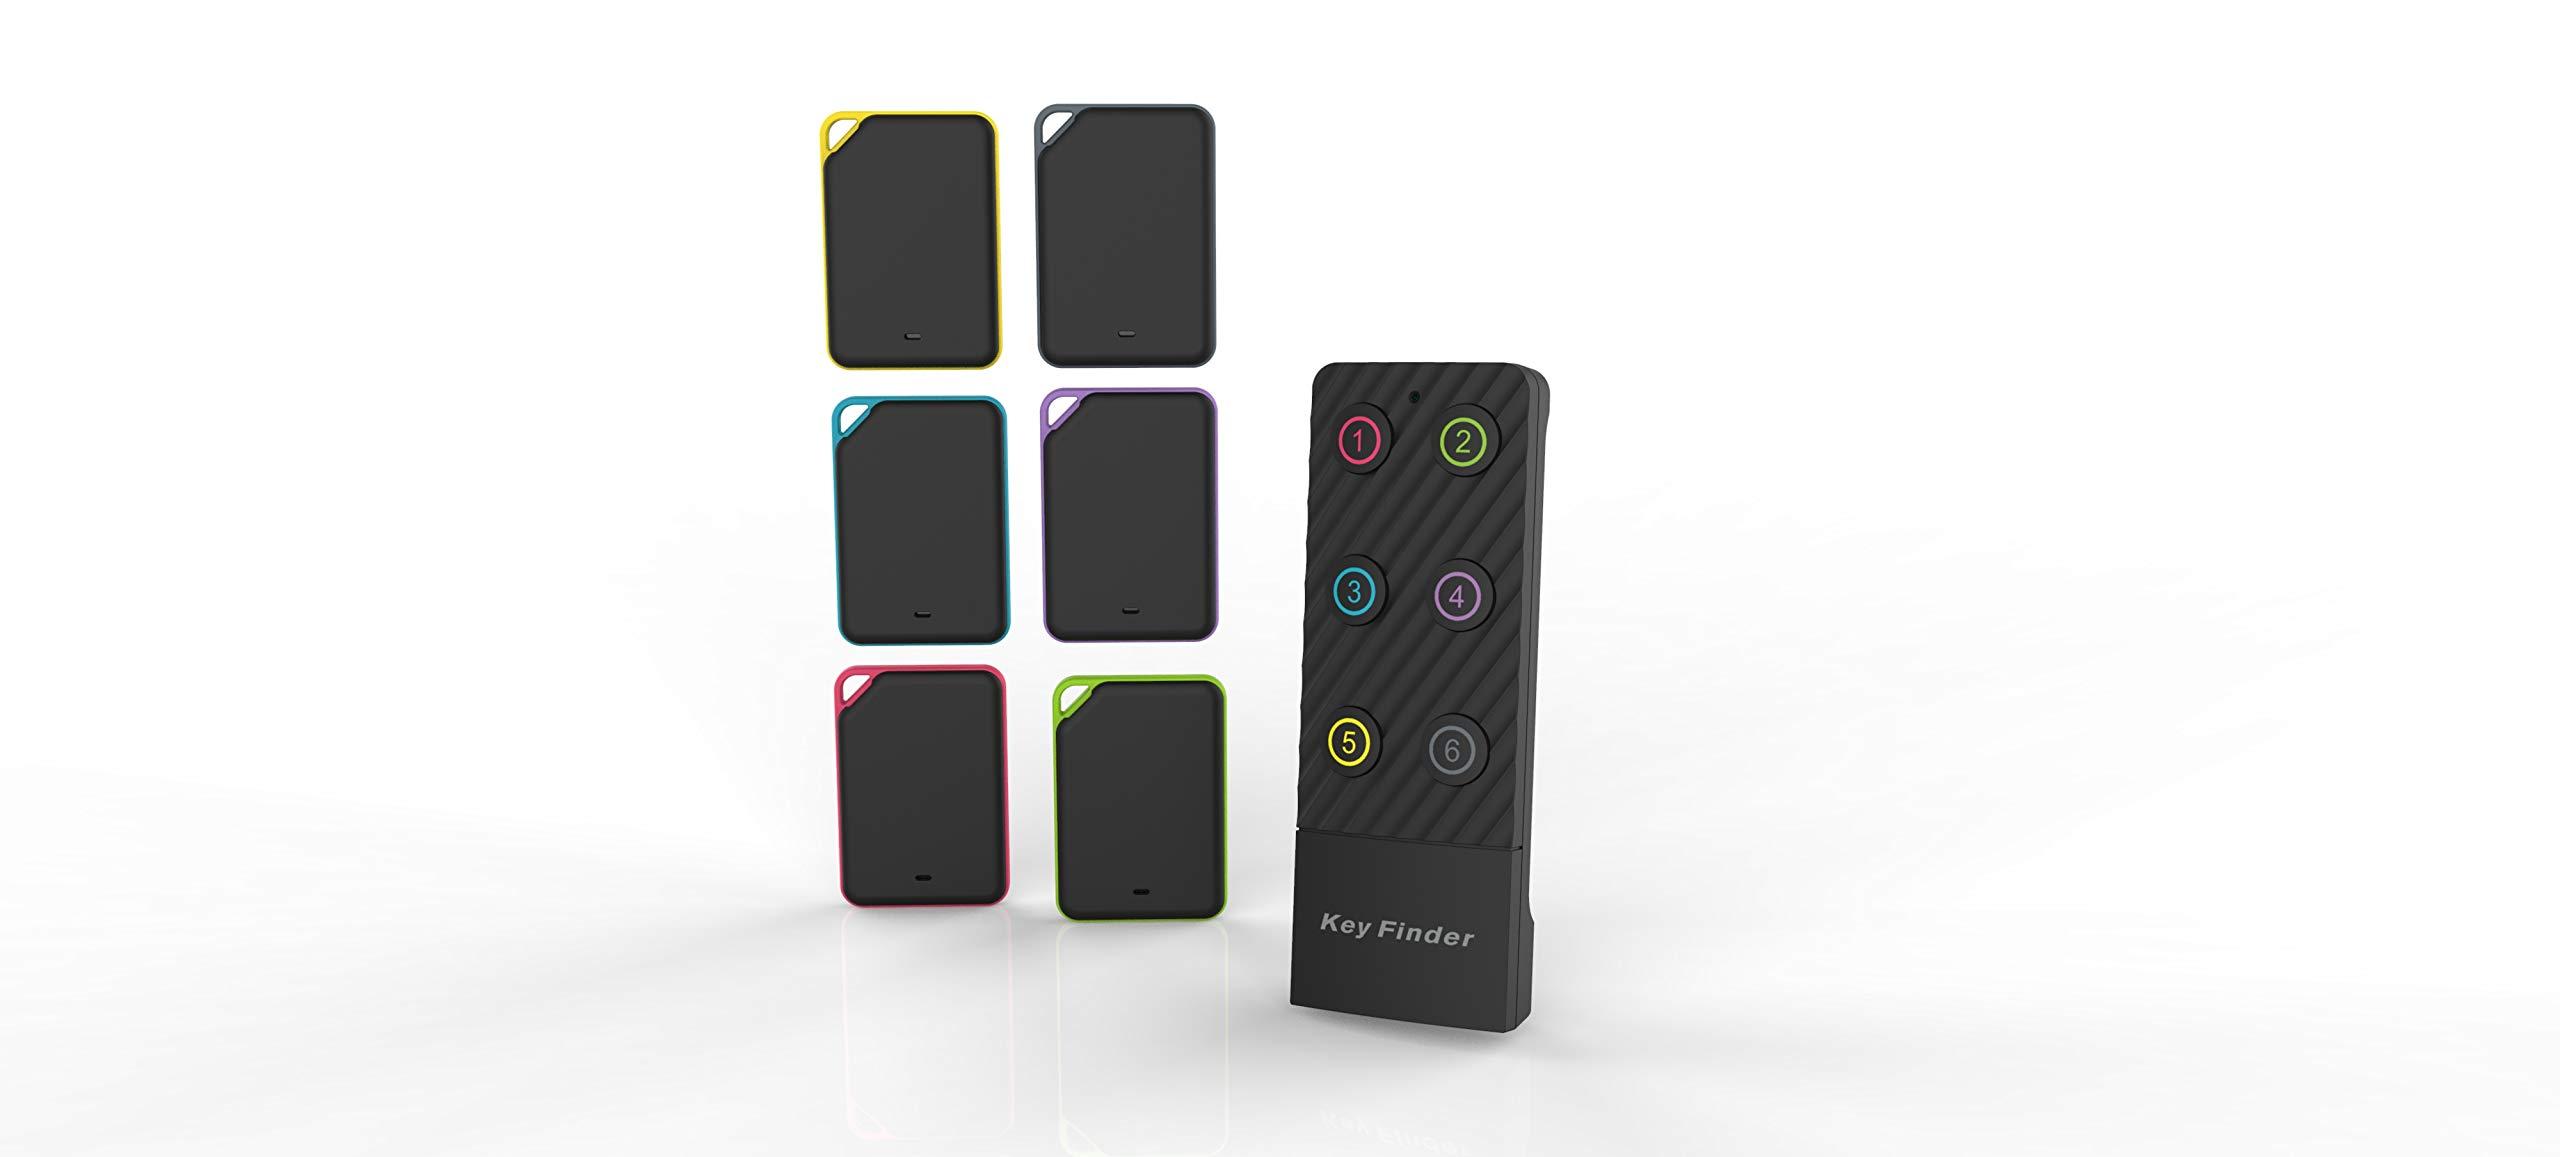 Key Finder Tracker,FindKey Wireless Key RF Locator Item Anti-Lost Tag Alarm Reminder Remote Finder,1 RF Transmitter 6 Receivers,Phone Pets Keychain Wallet Luggage Pet Tracking by FindKey